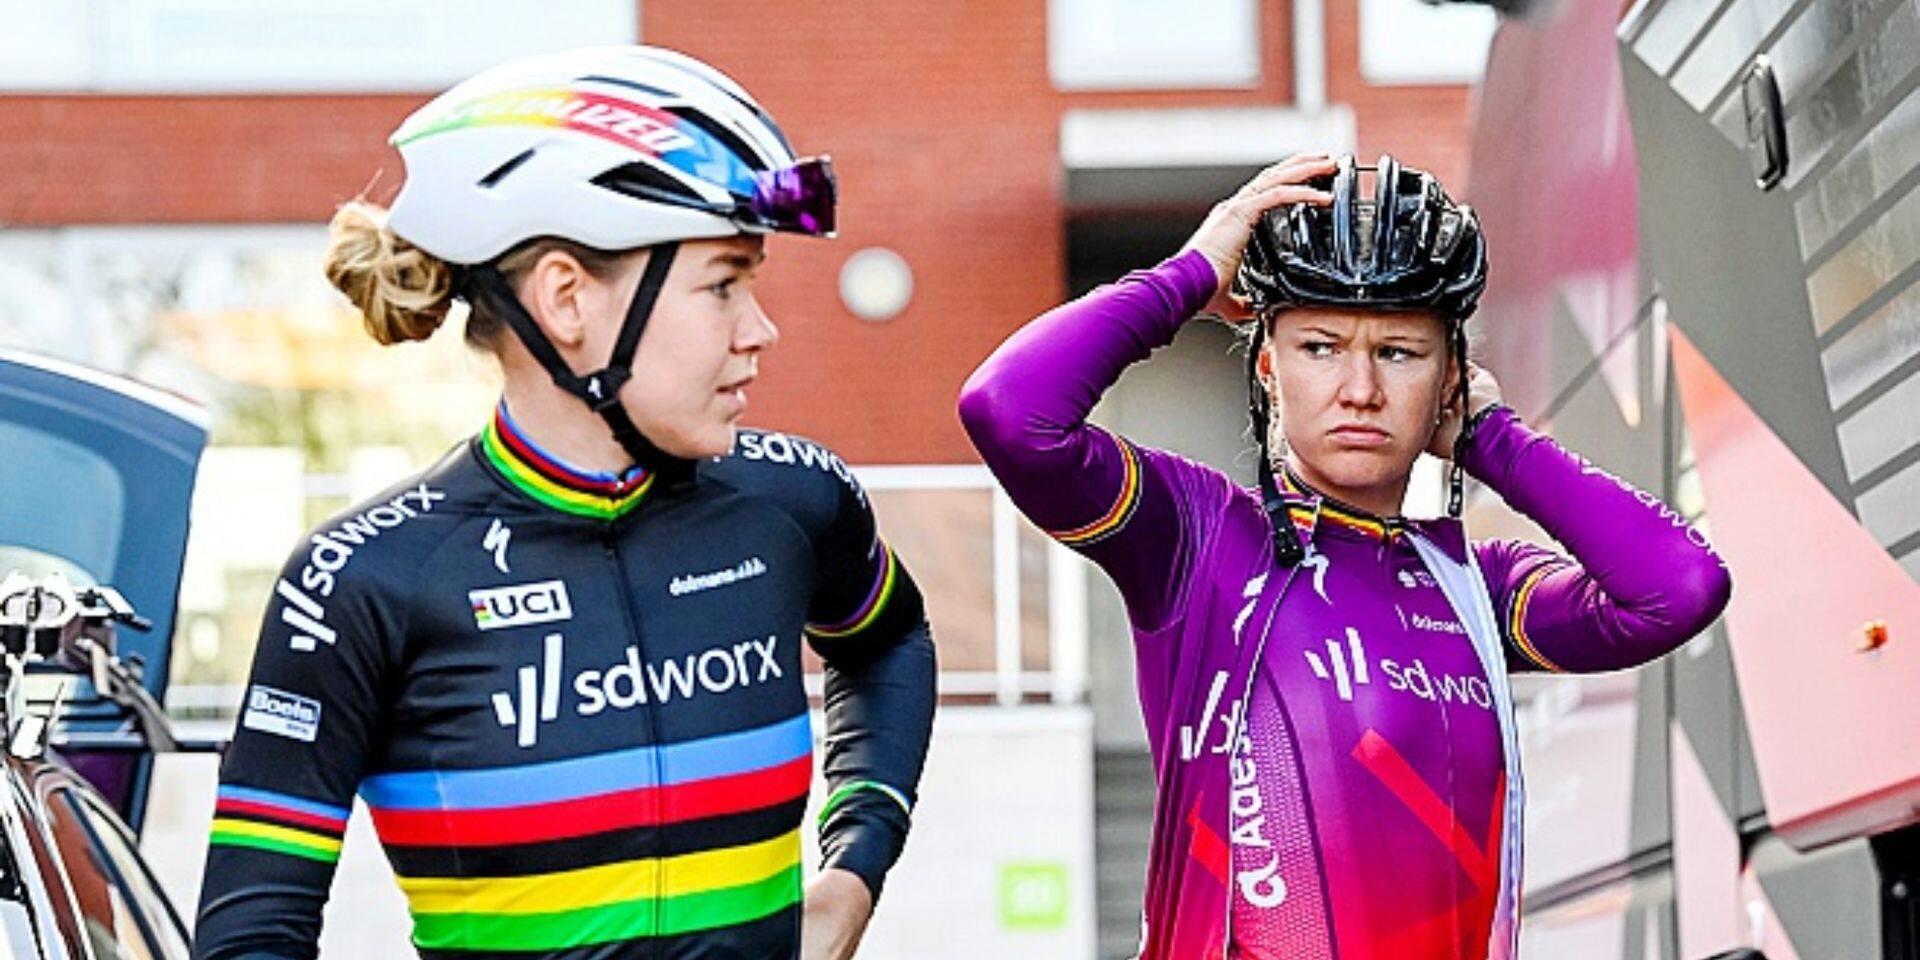 Het Nieuwsblad Dames : D'hoore et Kopecky espèrent combler une lacune